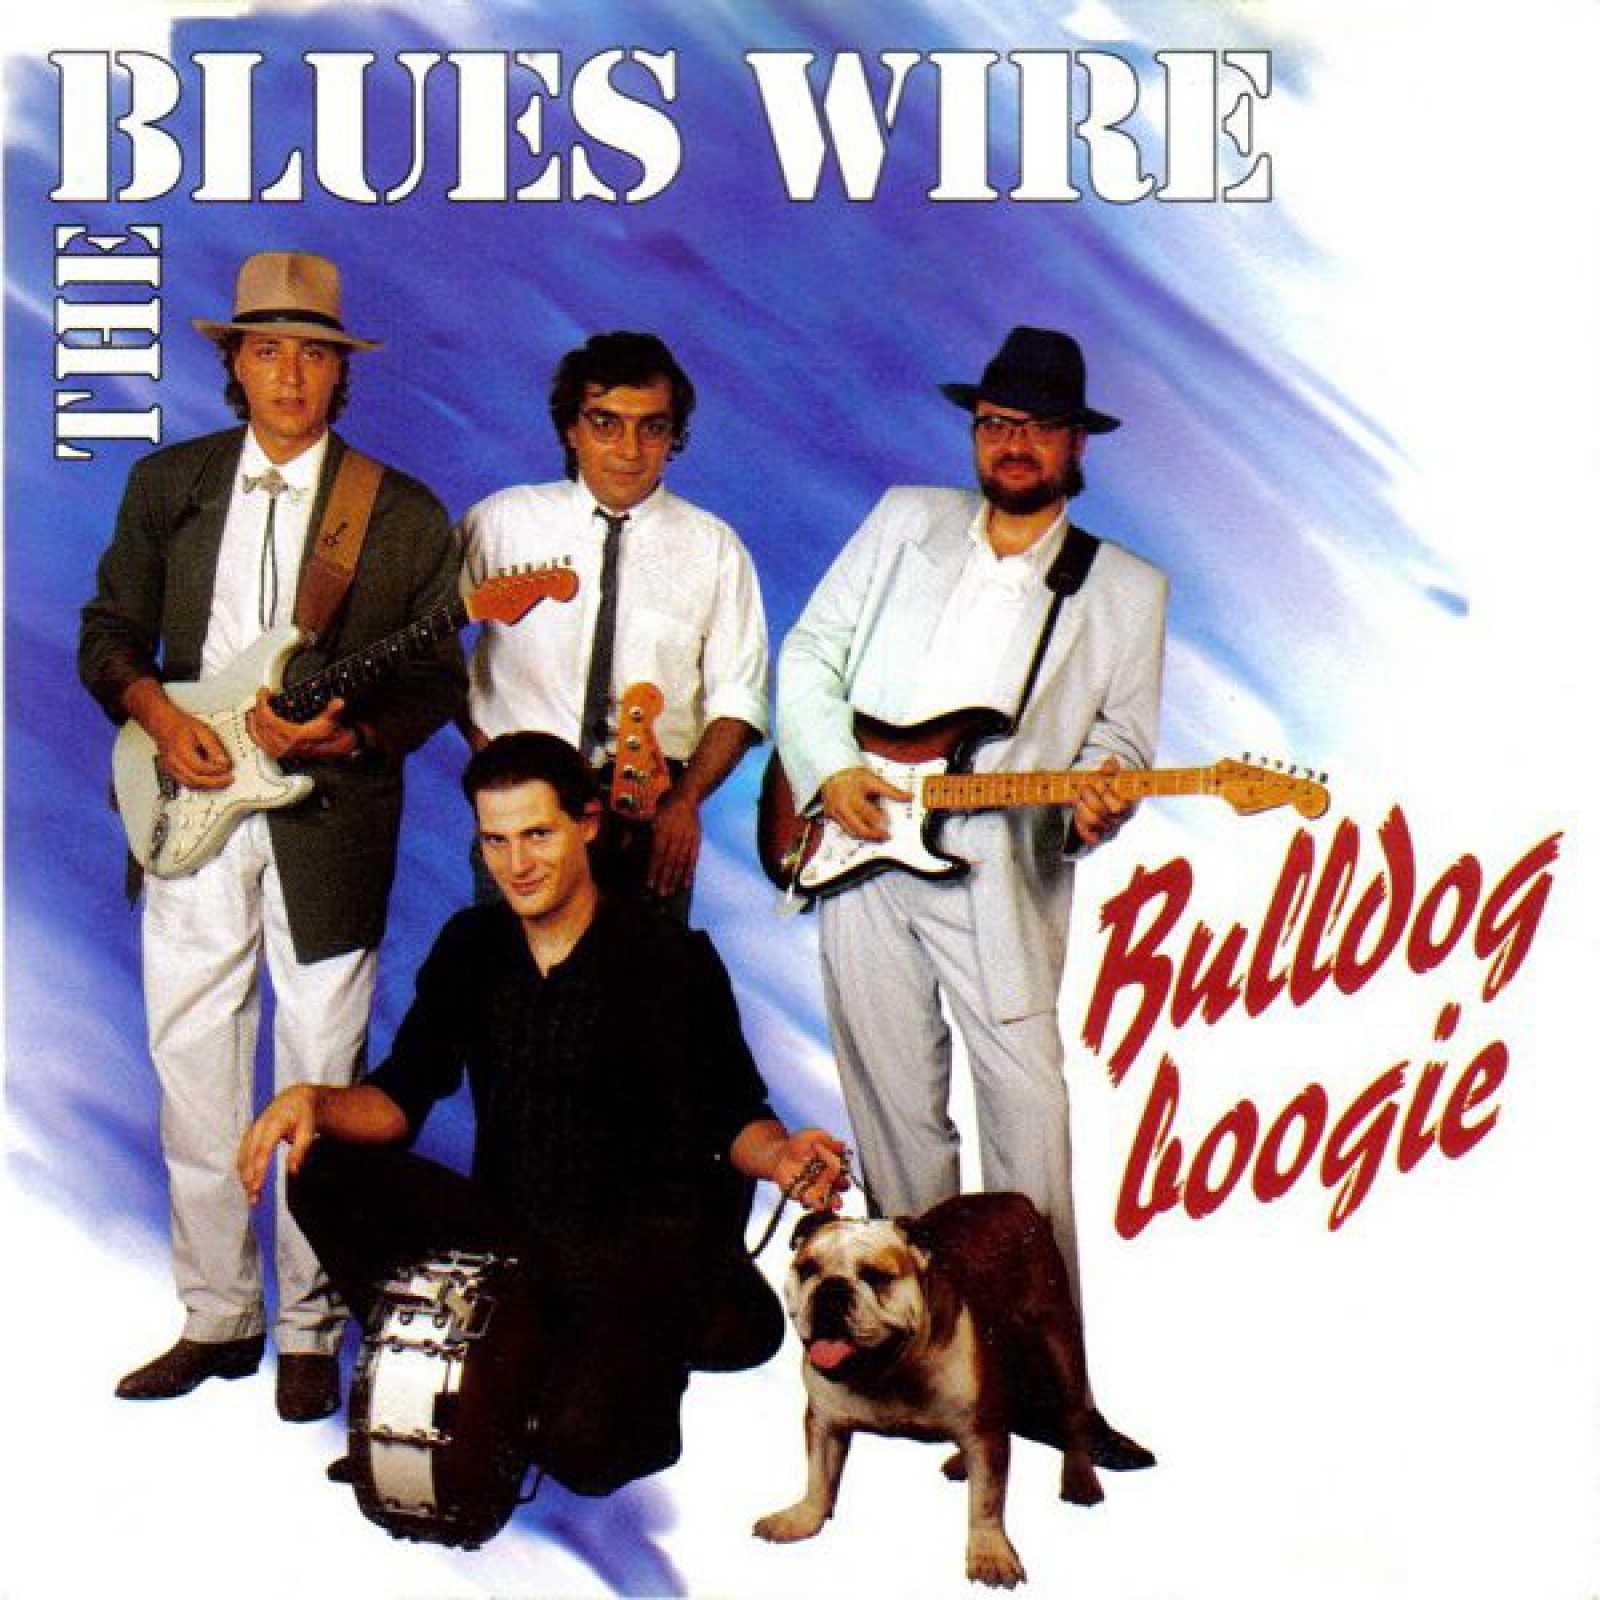 BULLDOG BOOGIE (1993)